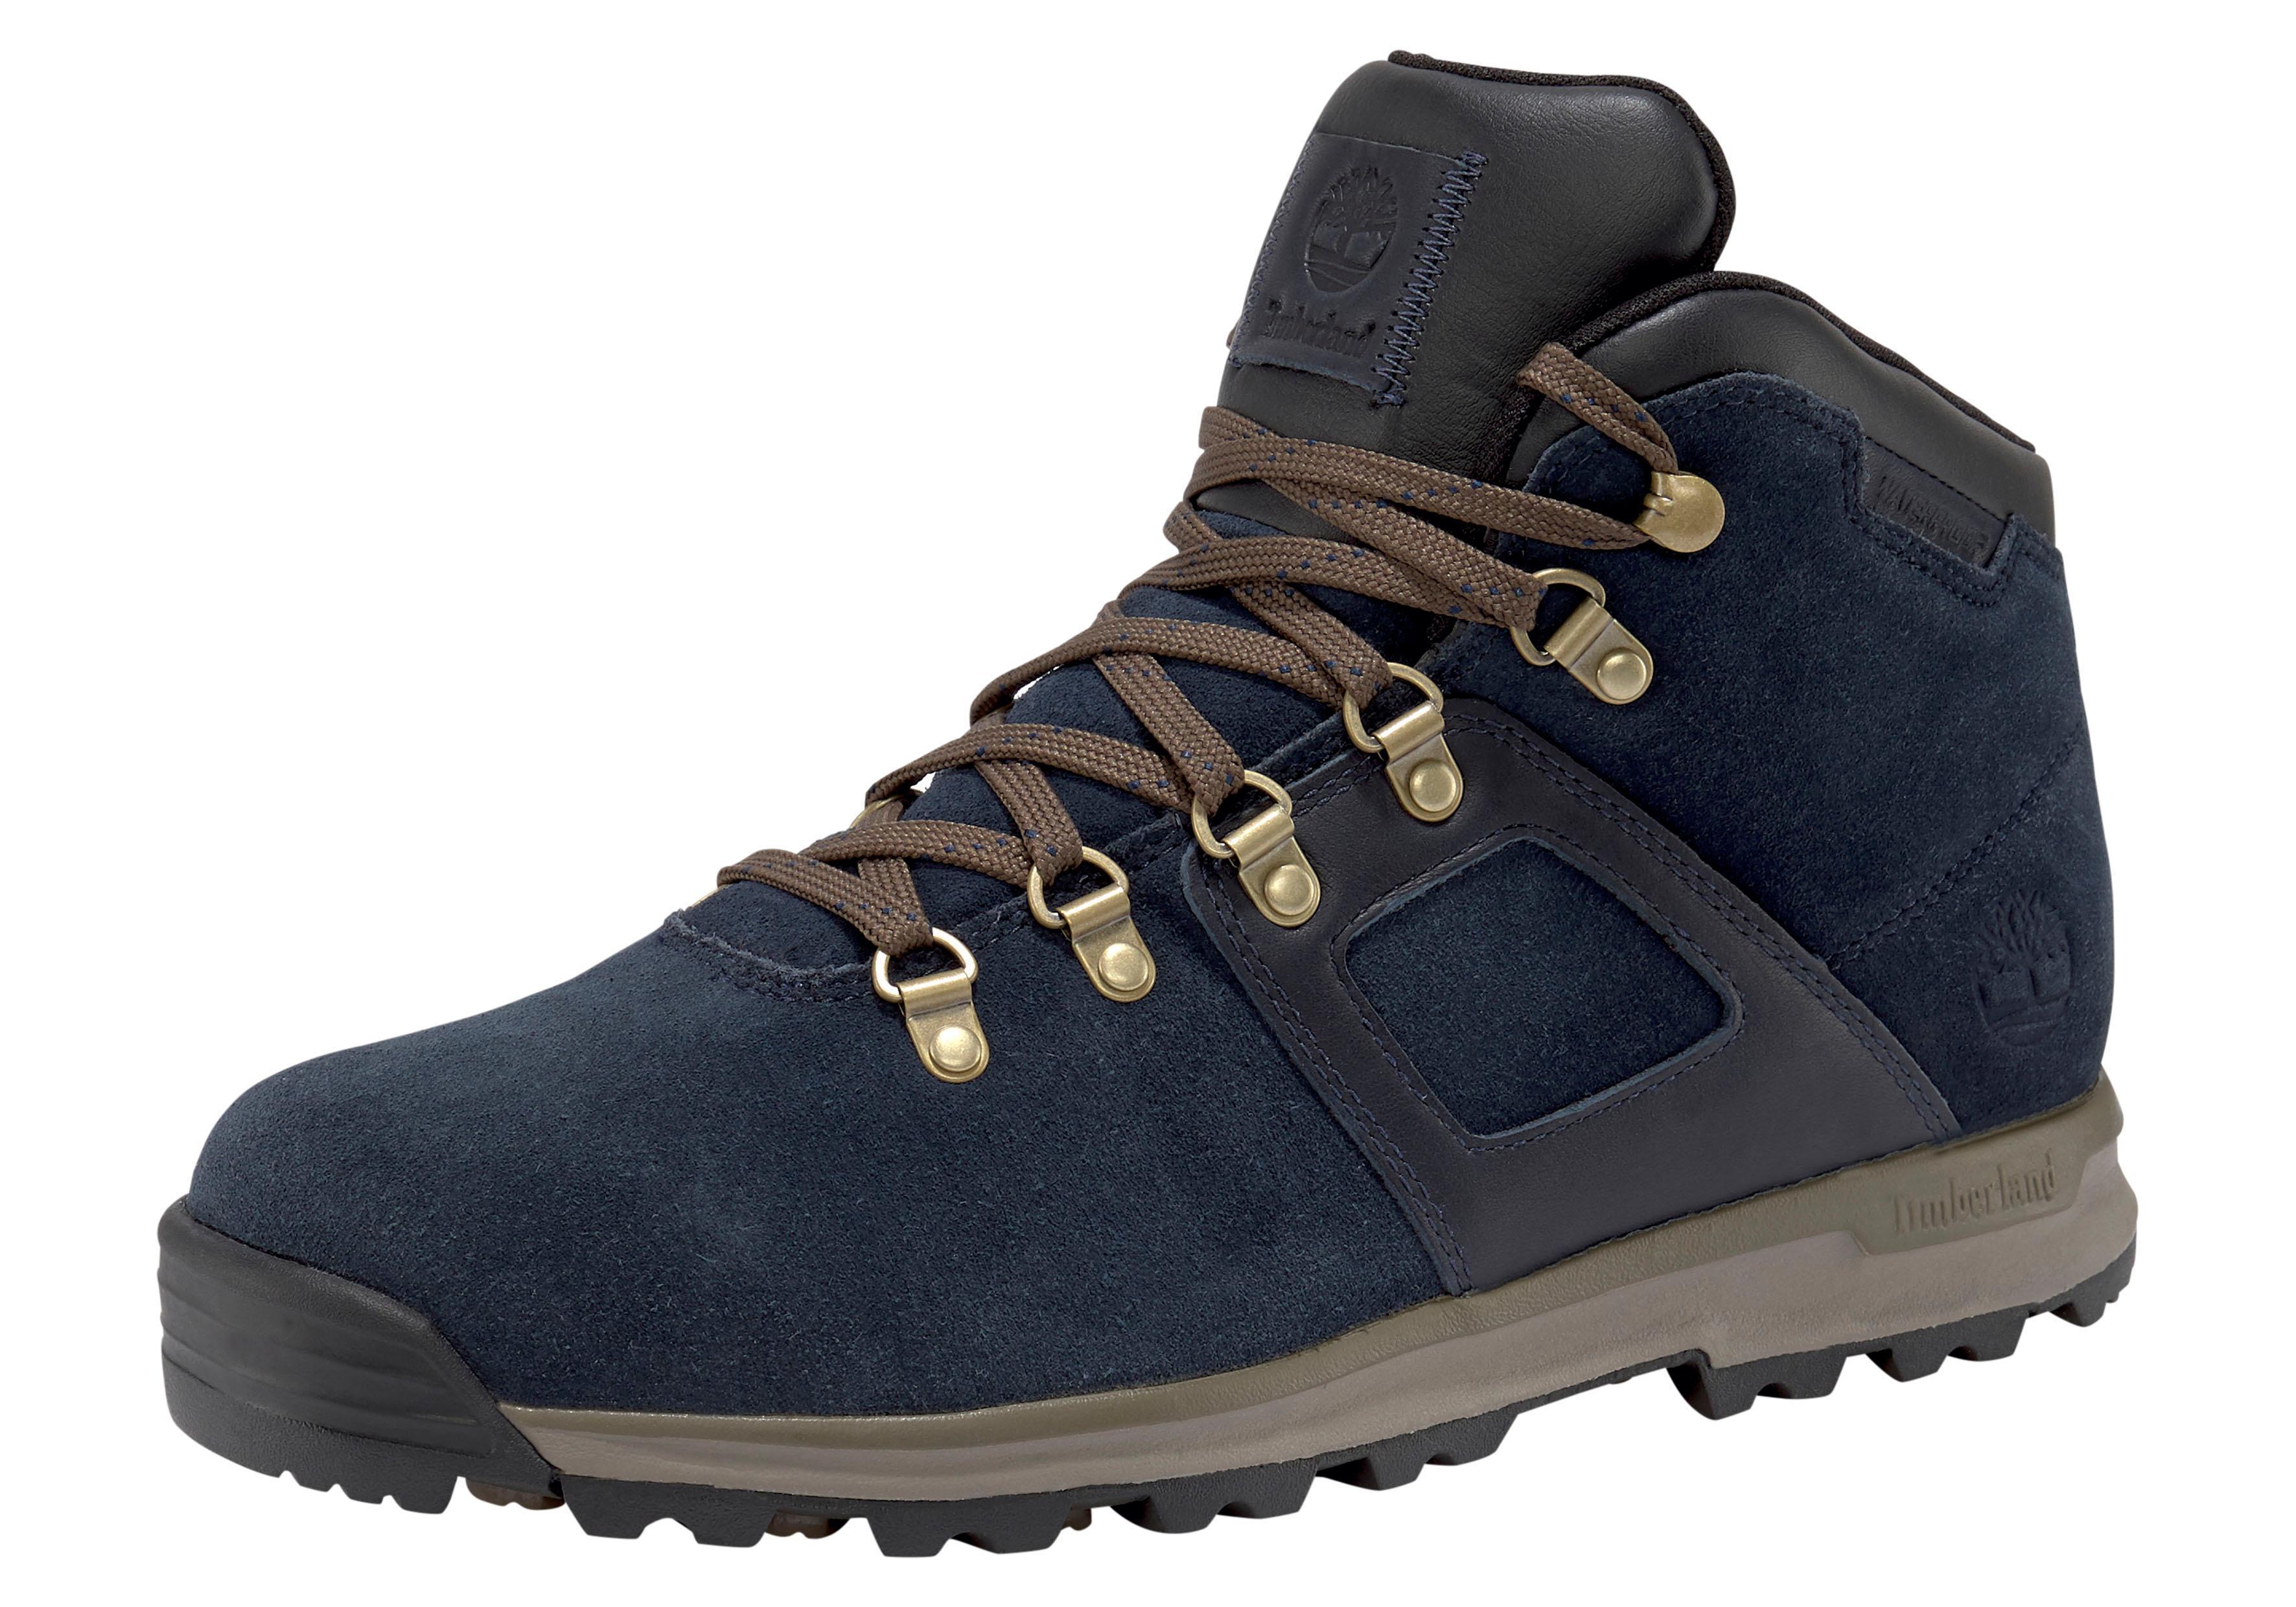 Timberland Wanderstiefel GT Scramble Mid Leather W | Schuhe > Outdoorschuhe > Wanderstiefel | Blau | Timberland Sportschuhe